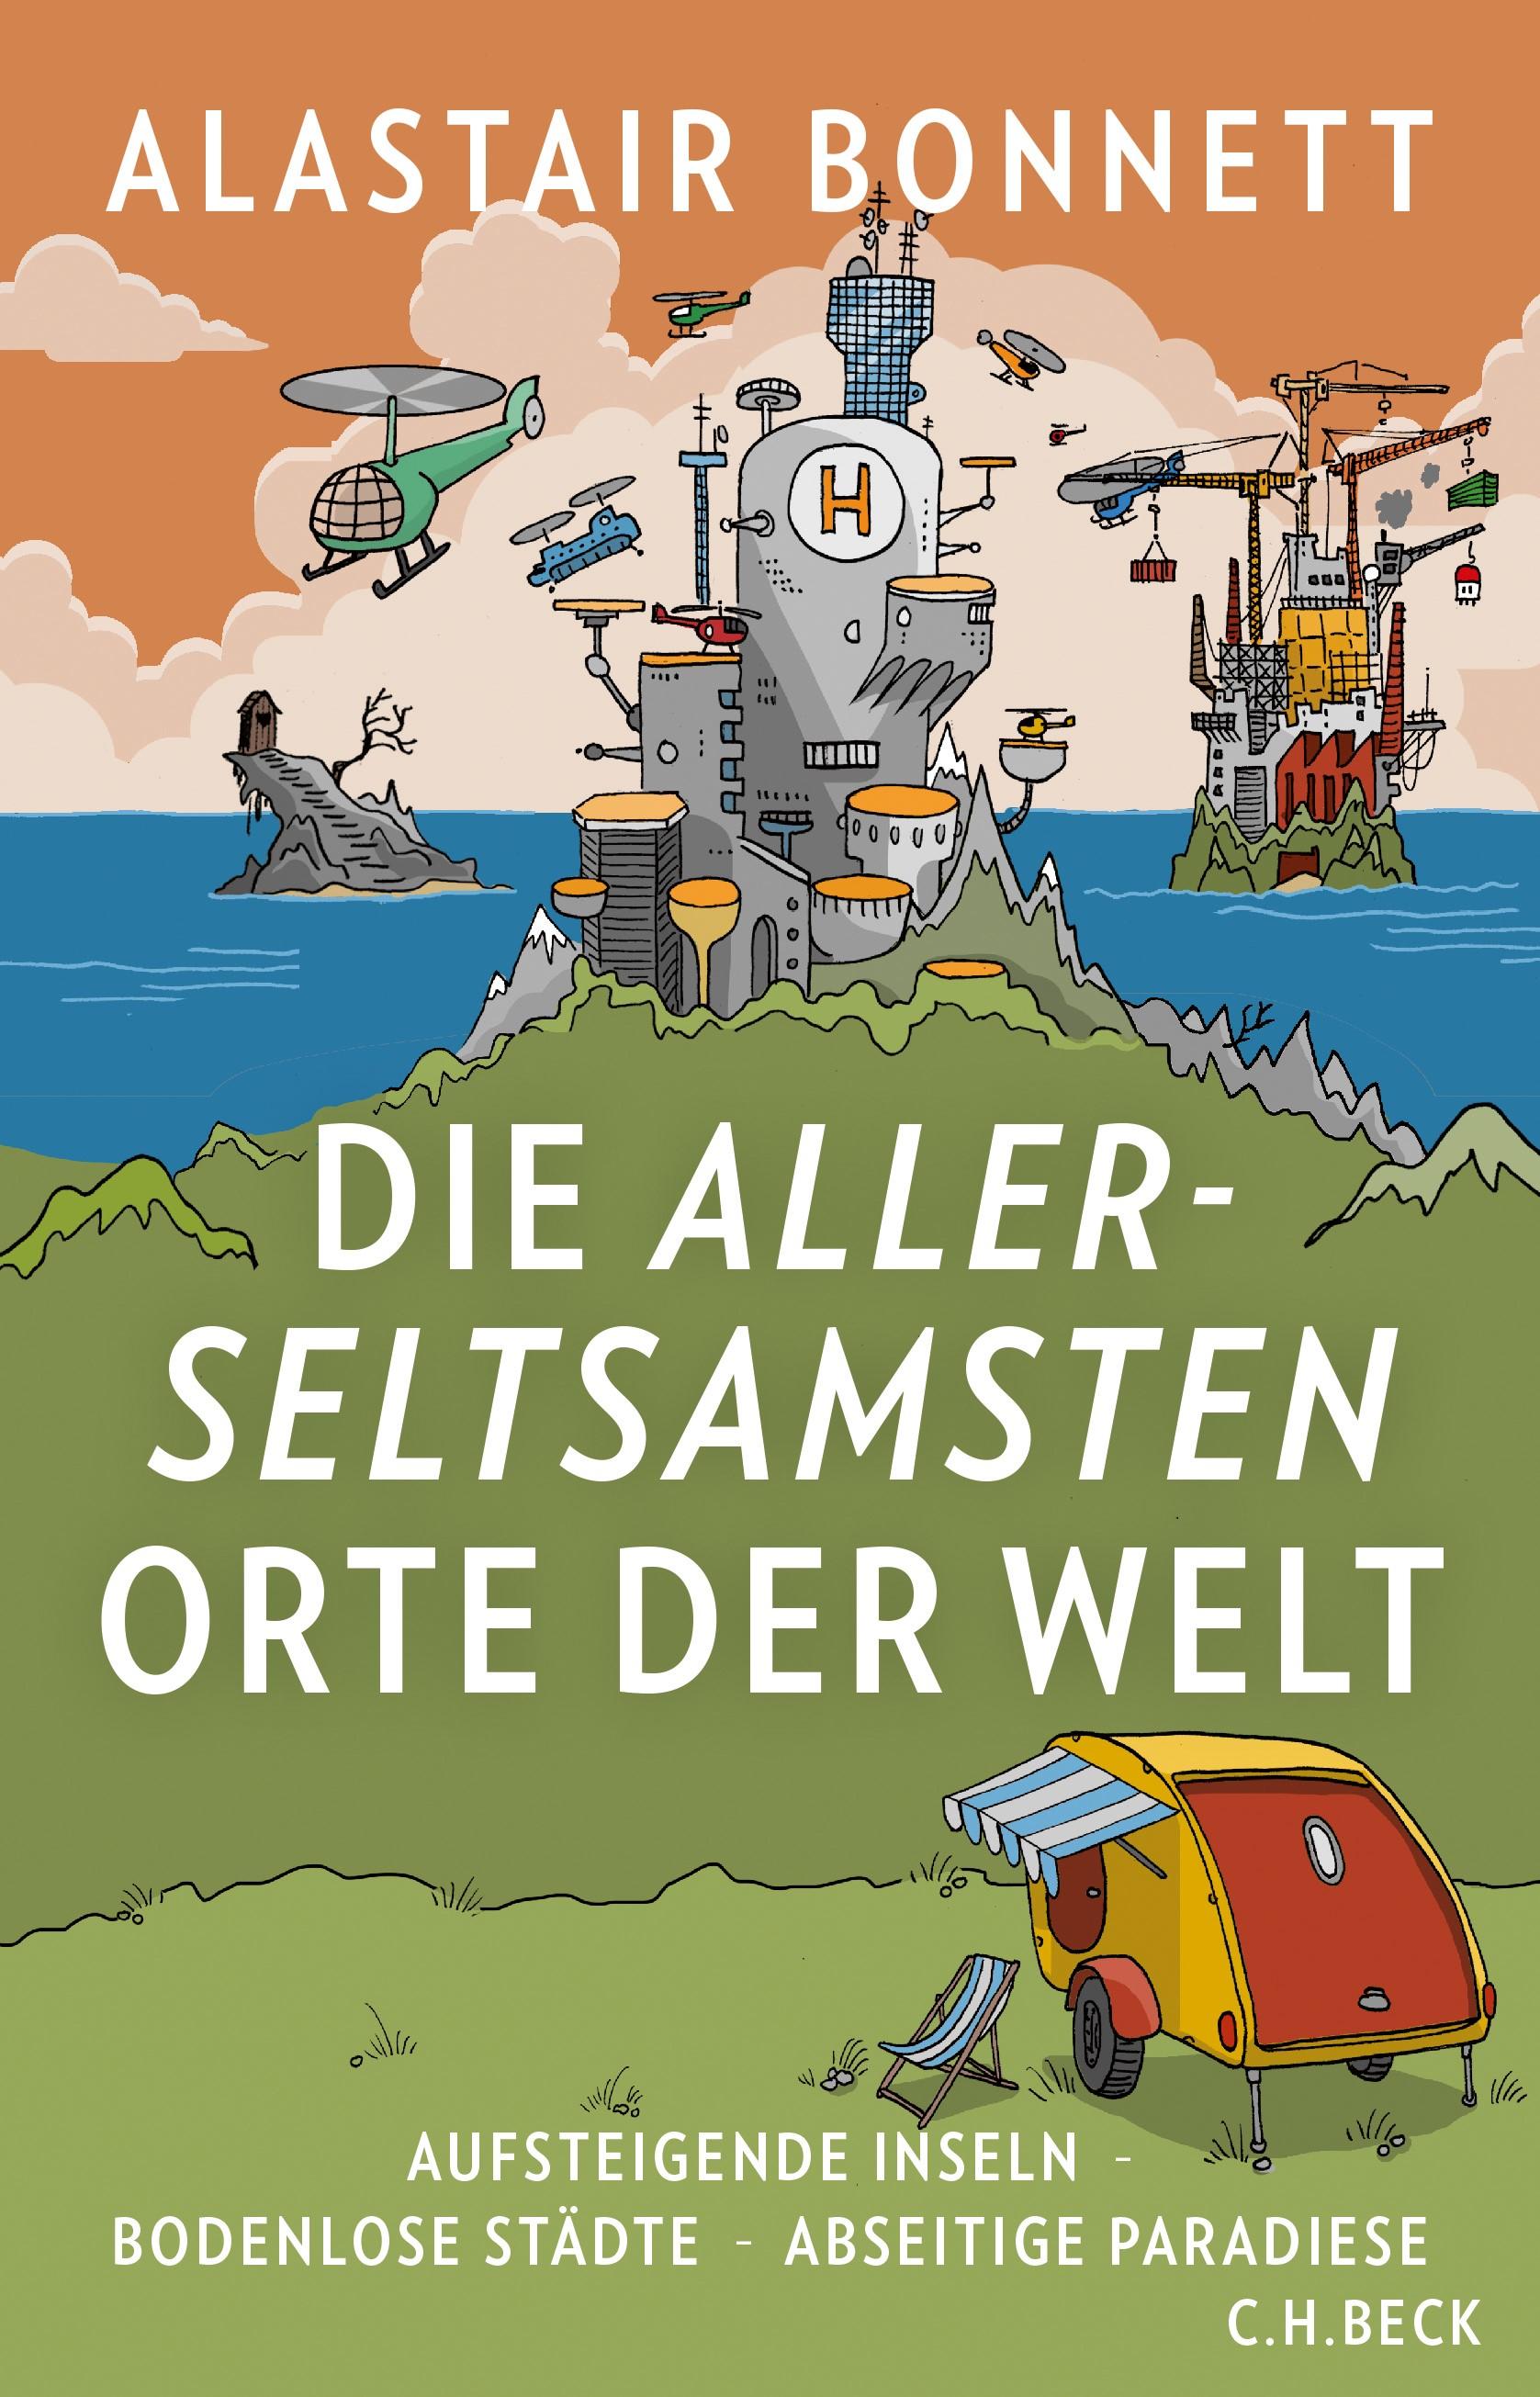 Die allerseltsamsten Orte der Welt | Bonnett, Alastair, 2019 | Buch (Cover)